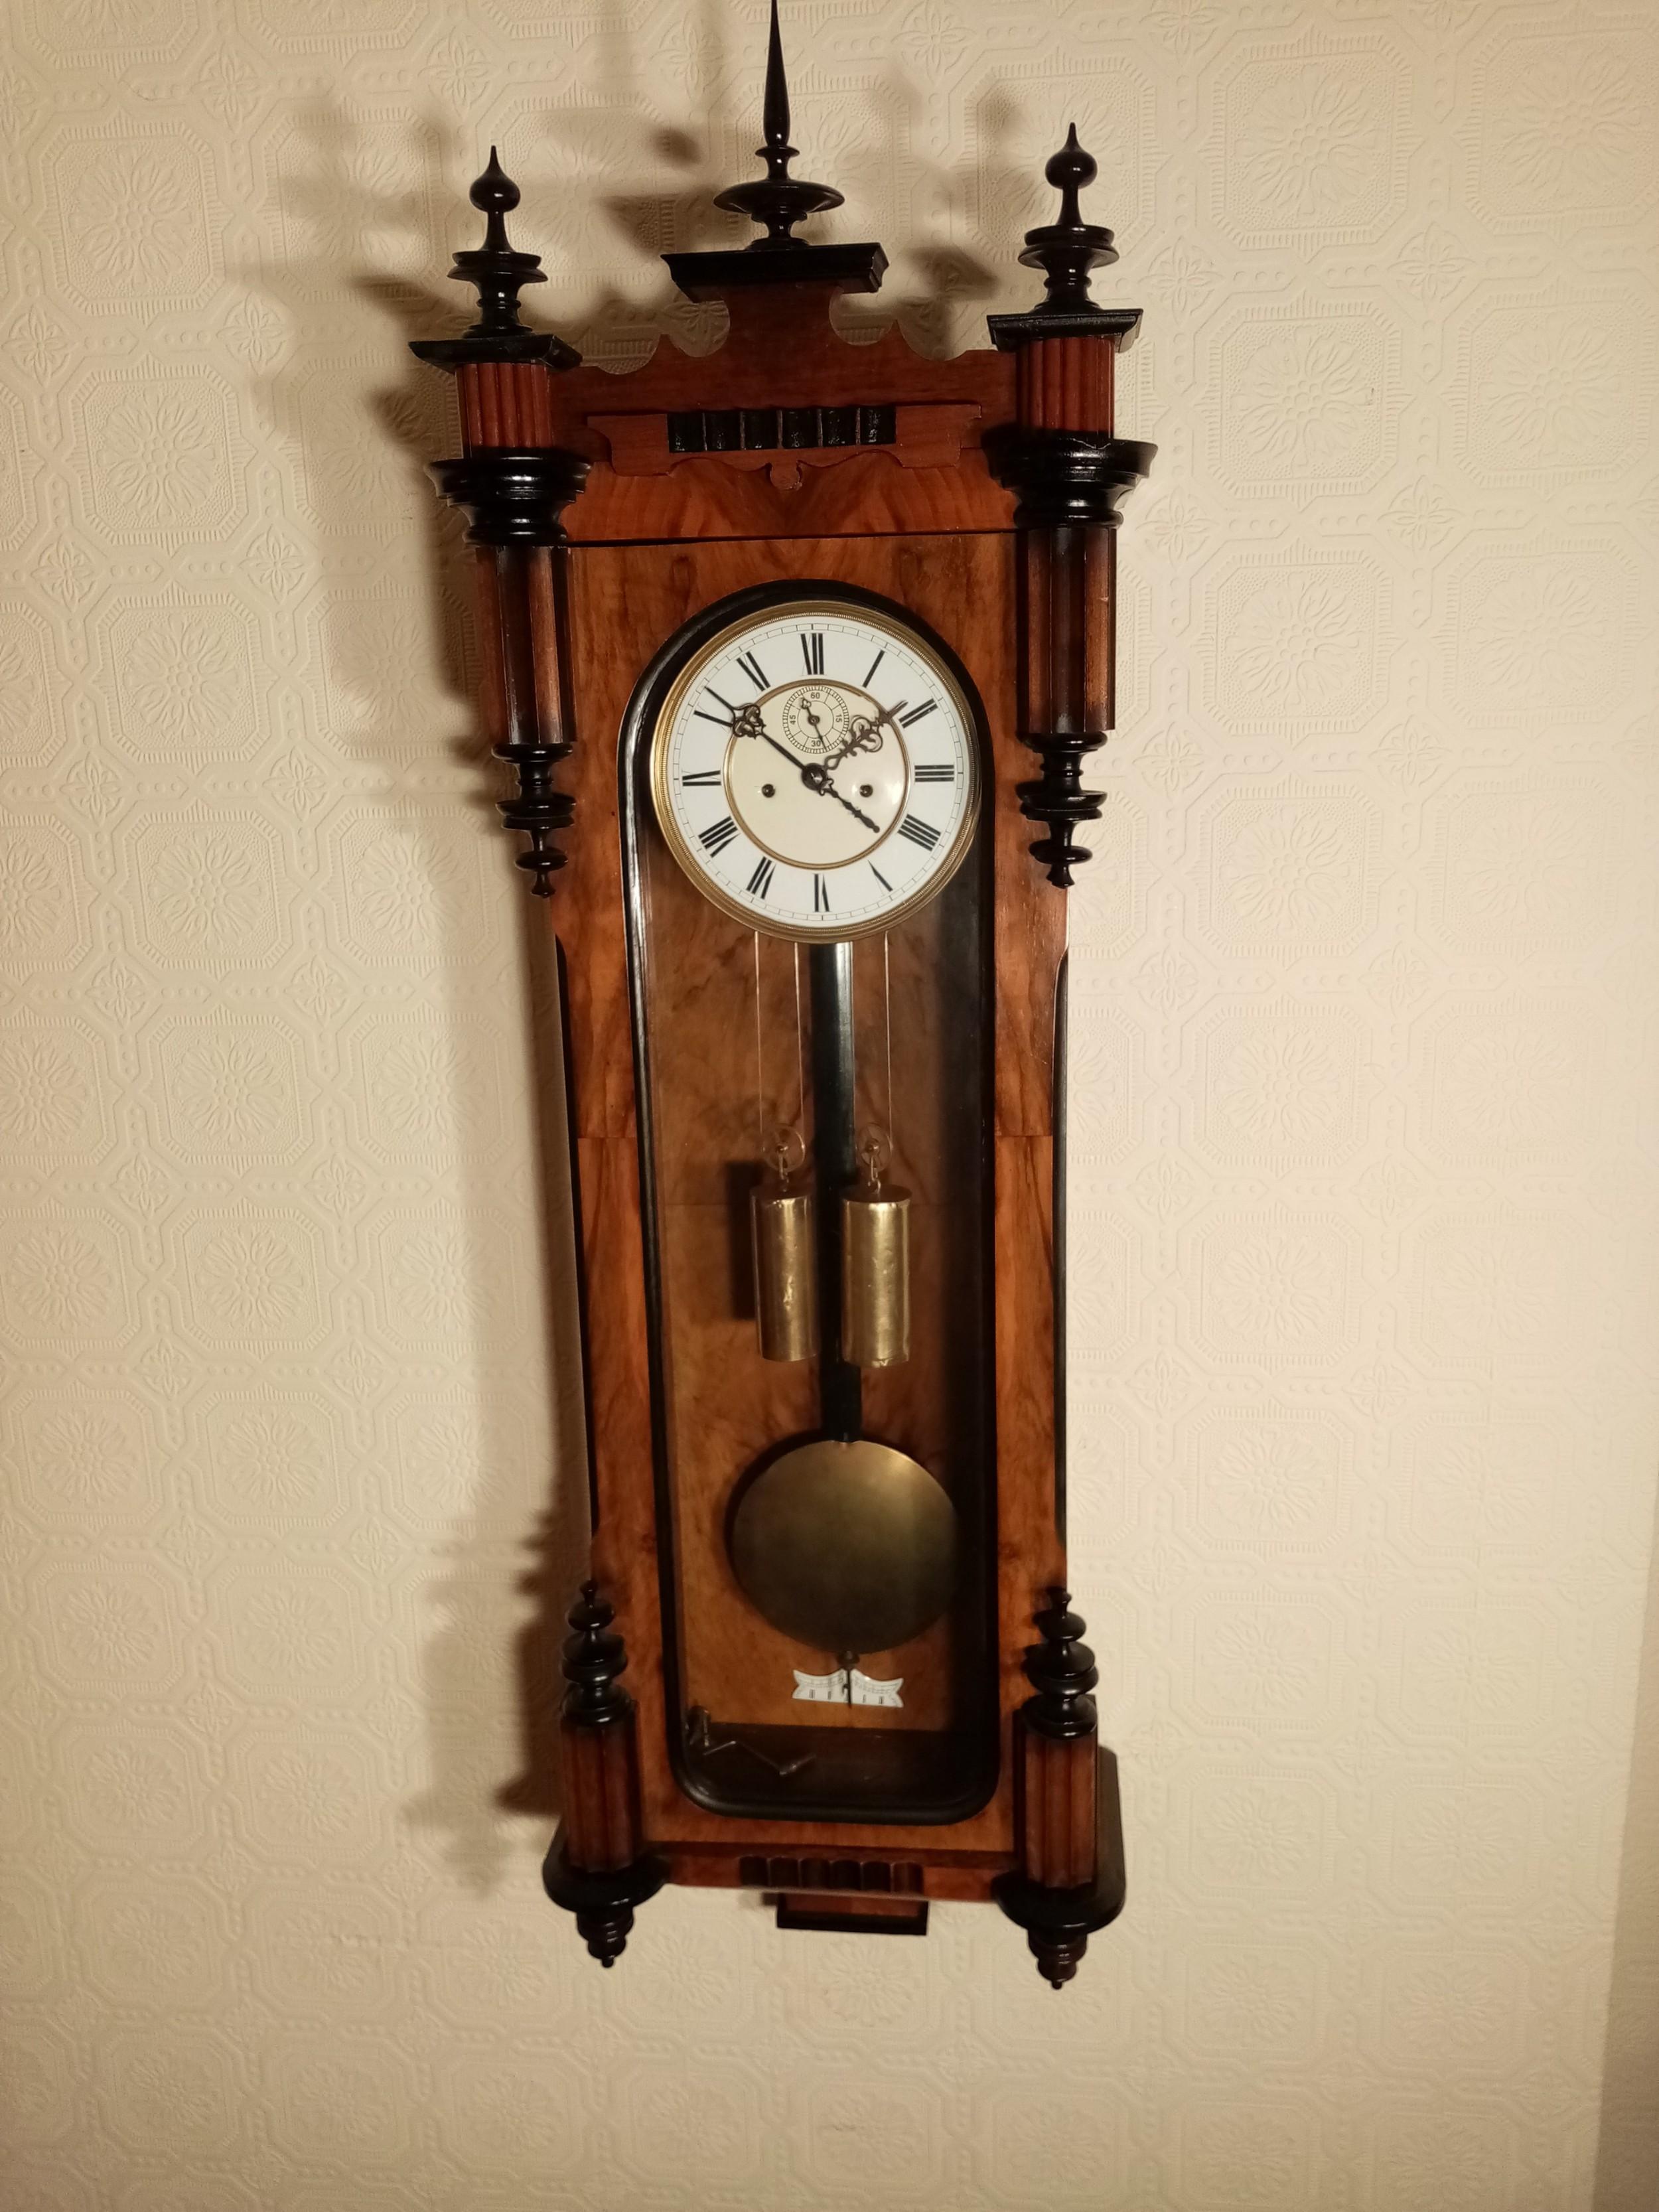 slimline doubleweight vienna wall clock